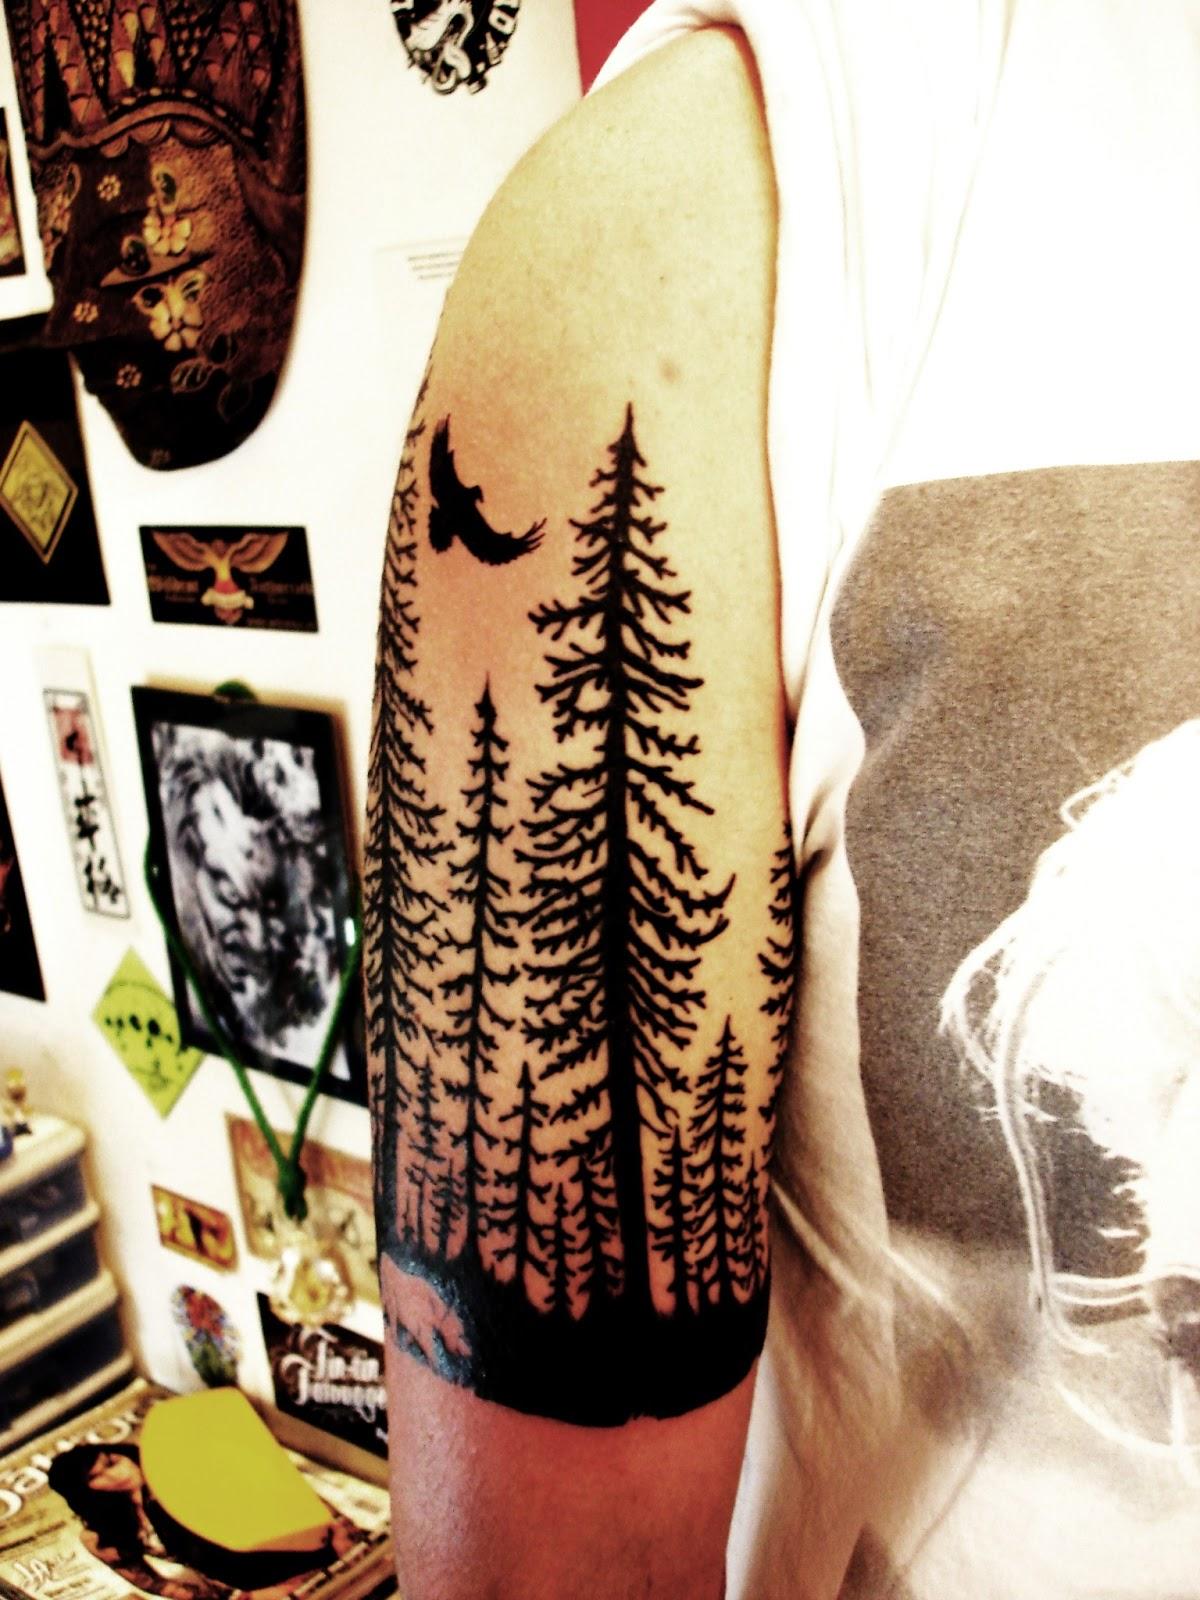 Toop Tattoo Bosque Tattoo Alicante Tatuaje